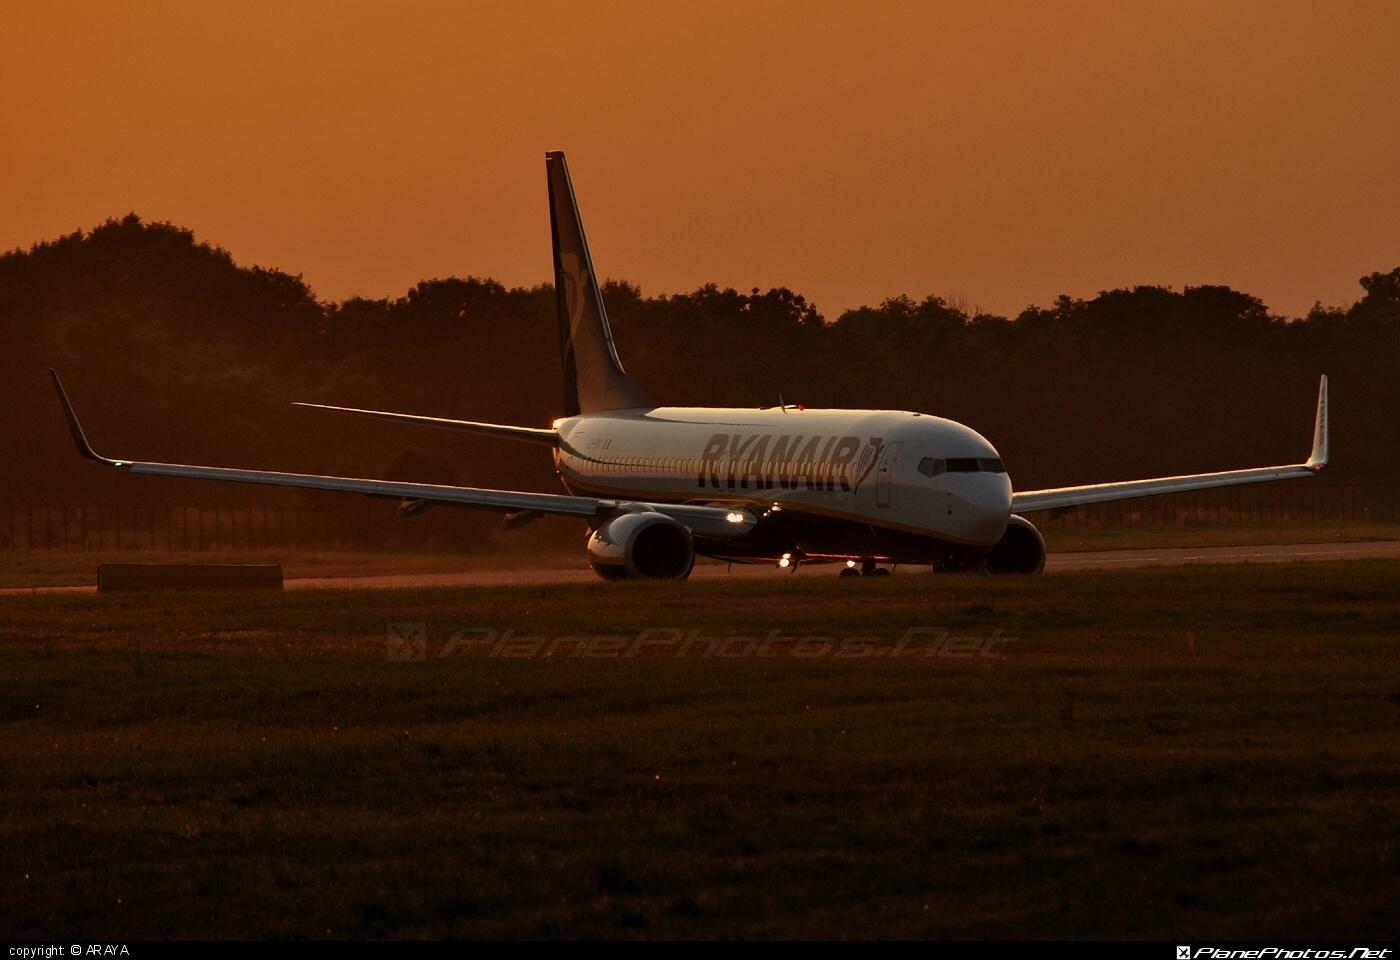 Boeing 737-800 - EI-EKI operated by Ryanair #b737 #b737nextgen #b737ng #boeing #boeing737 #ryanair